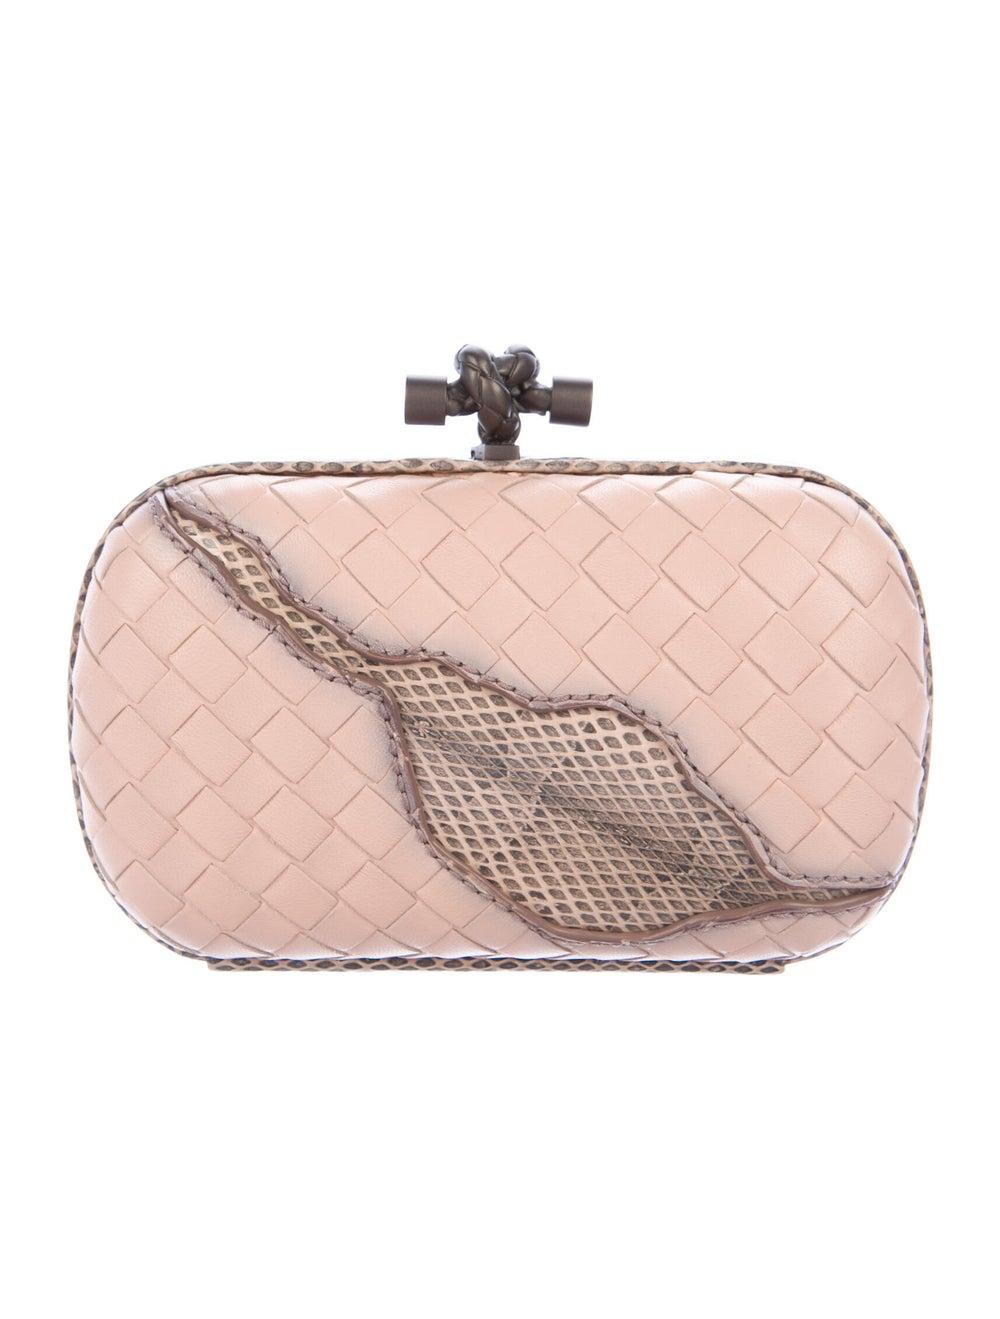 Bottega Veneta Ayers-Trimmed Box Clutch Pink - image 4